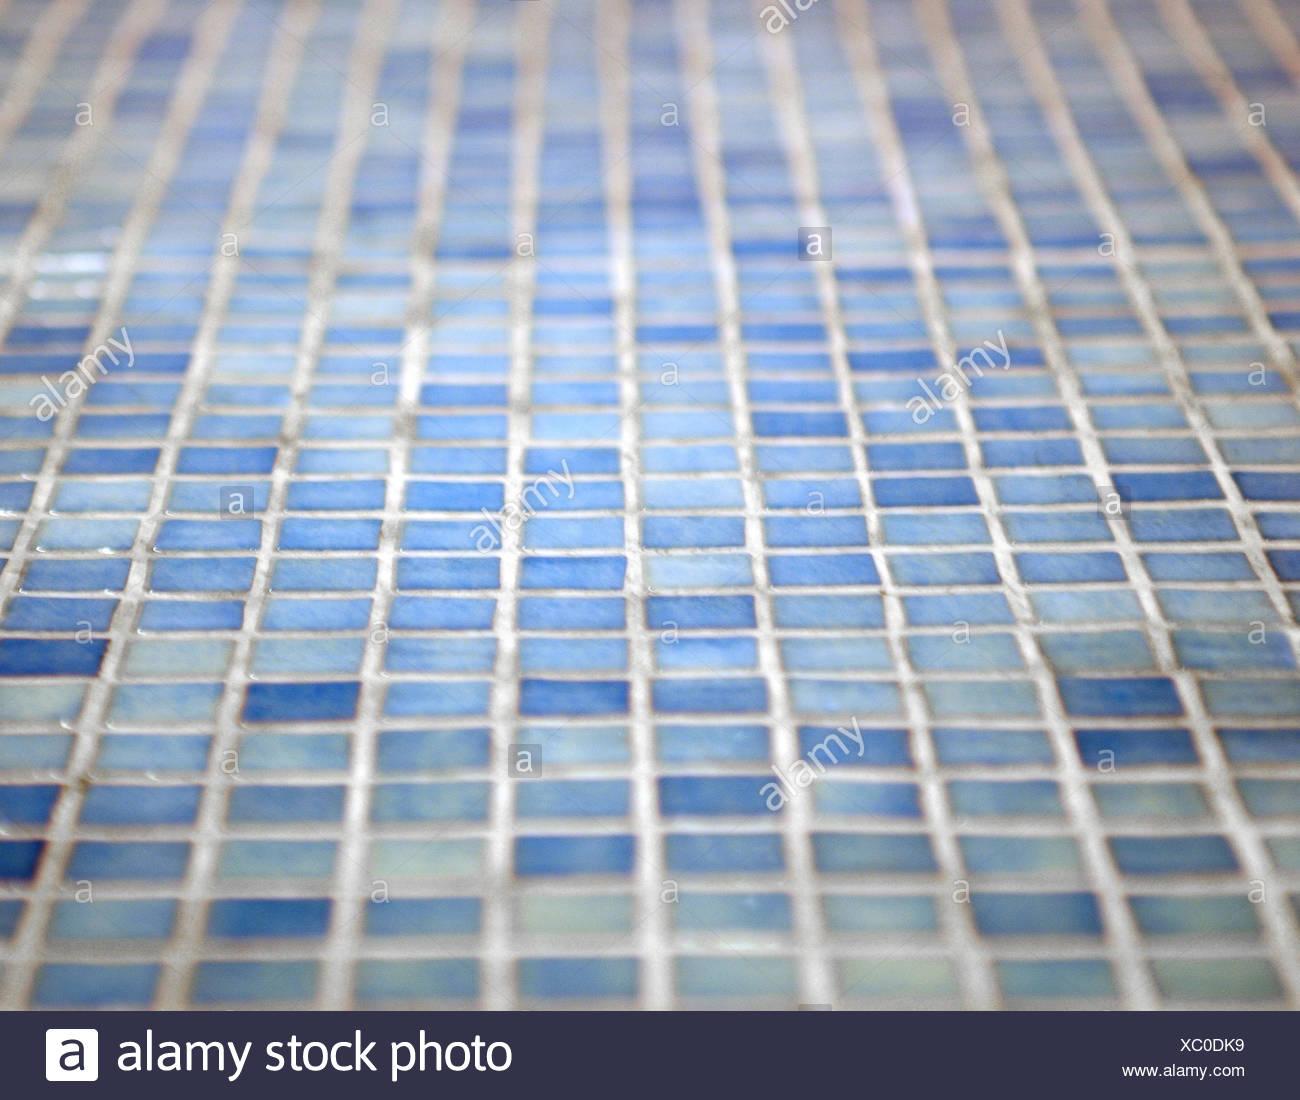 Mosaic floor, blue, floor, mosaic floor, tiles, tiled, mosaic, bathroom, bath, bathroom floor, turquoise, light blue, pattern, squares, mosaic tiles, blue turquoise, no people, blur, - Stock Image